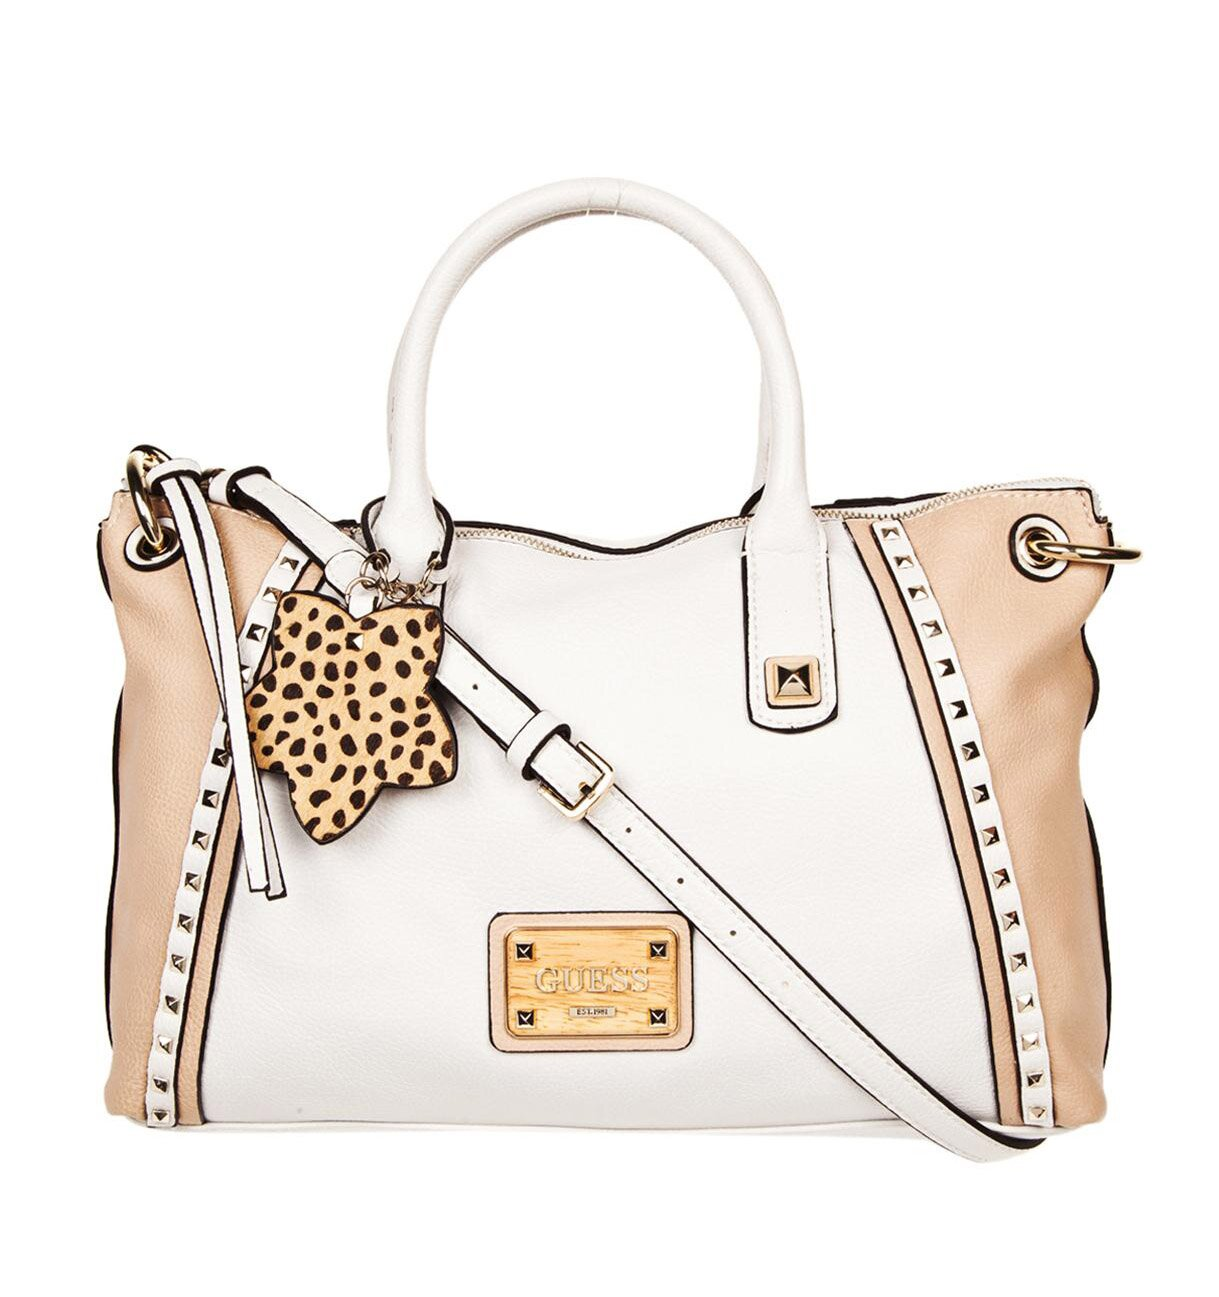 New Styles Of White Handbags